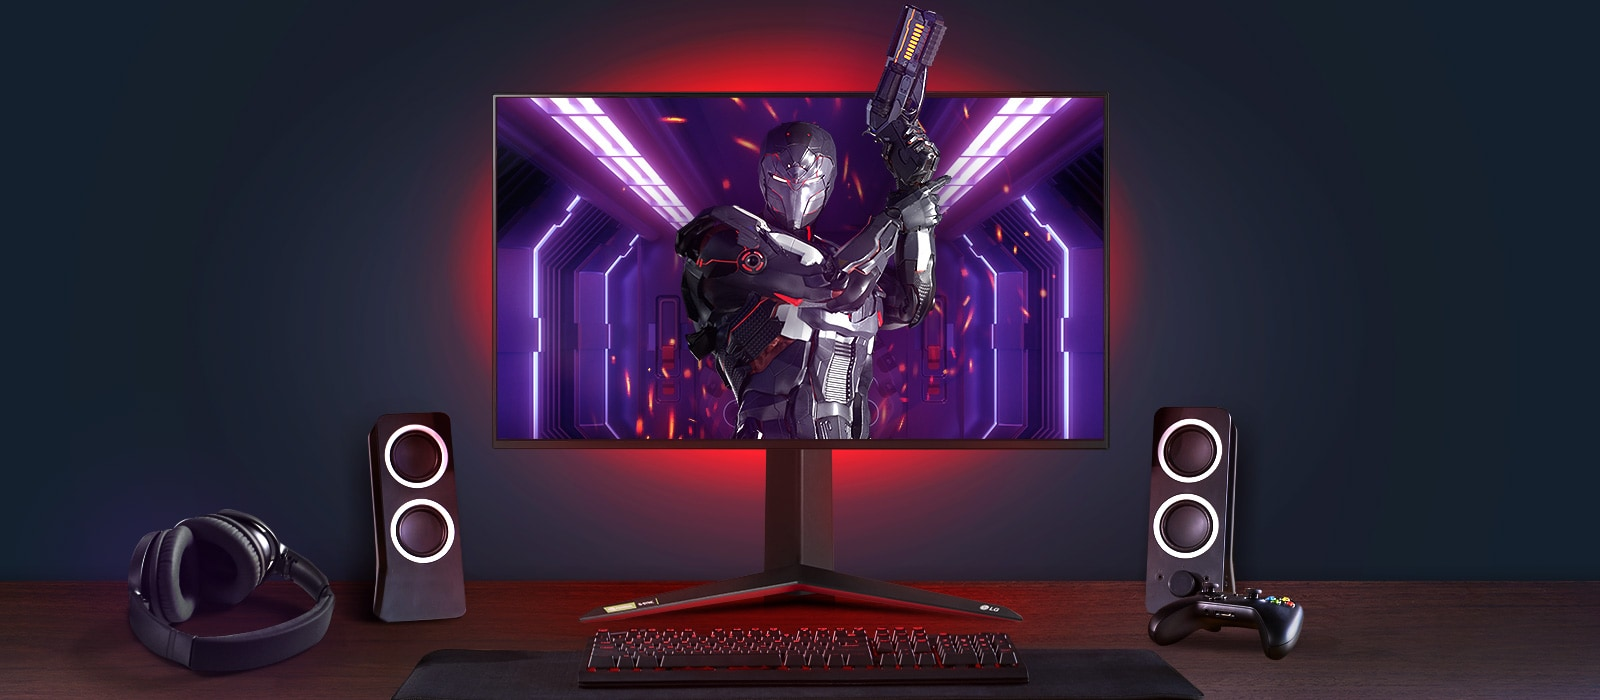 LG 27GN950: miglior monitor gaming 4K